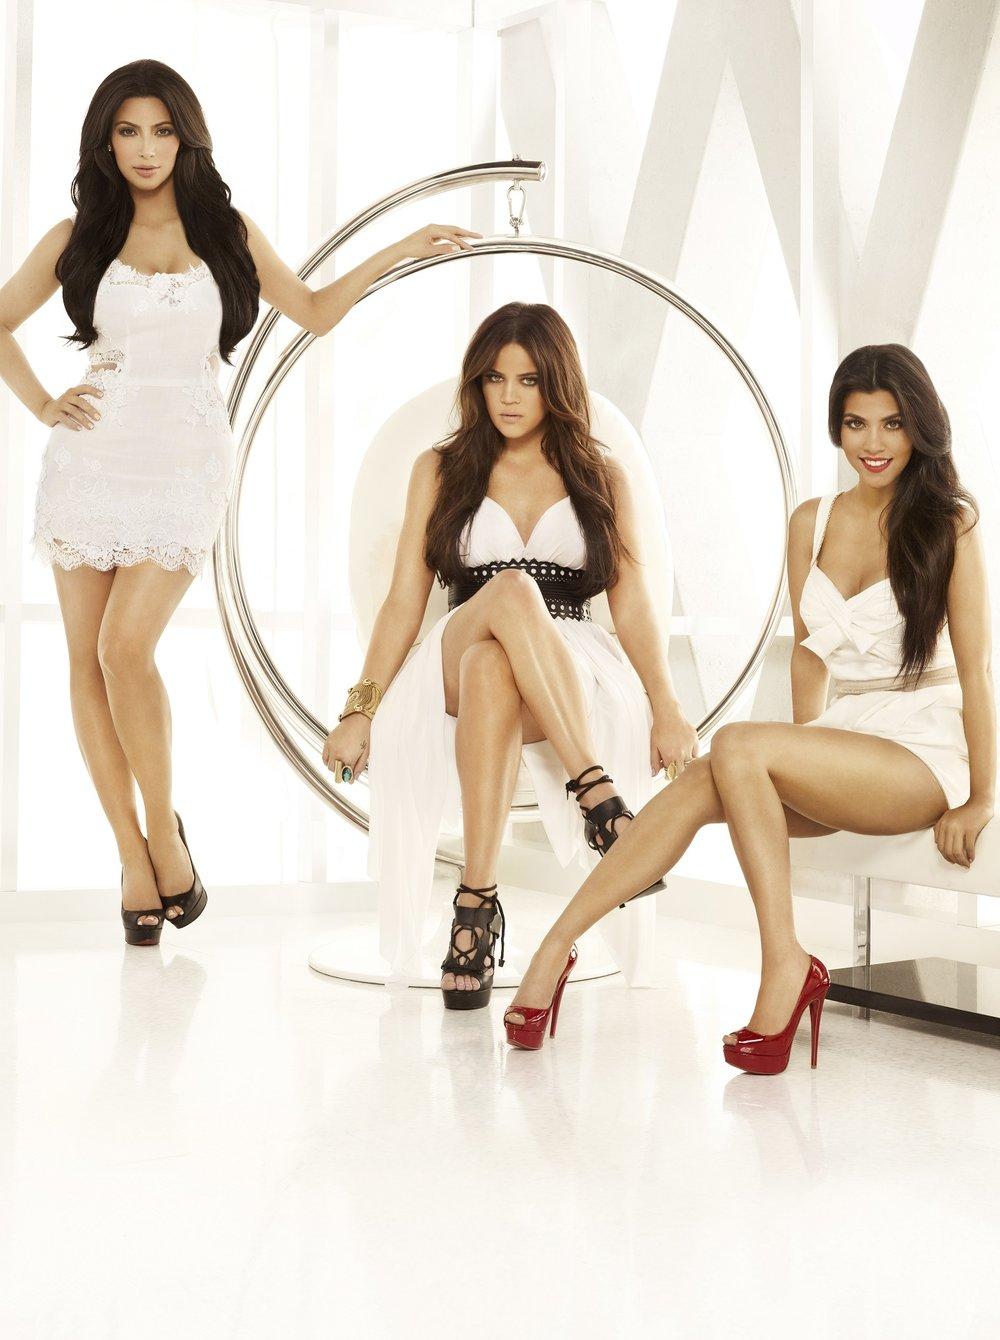 Kardashians S07 (7).jpg